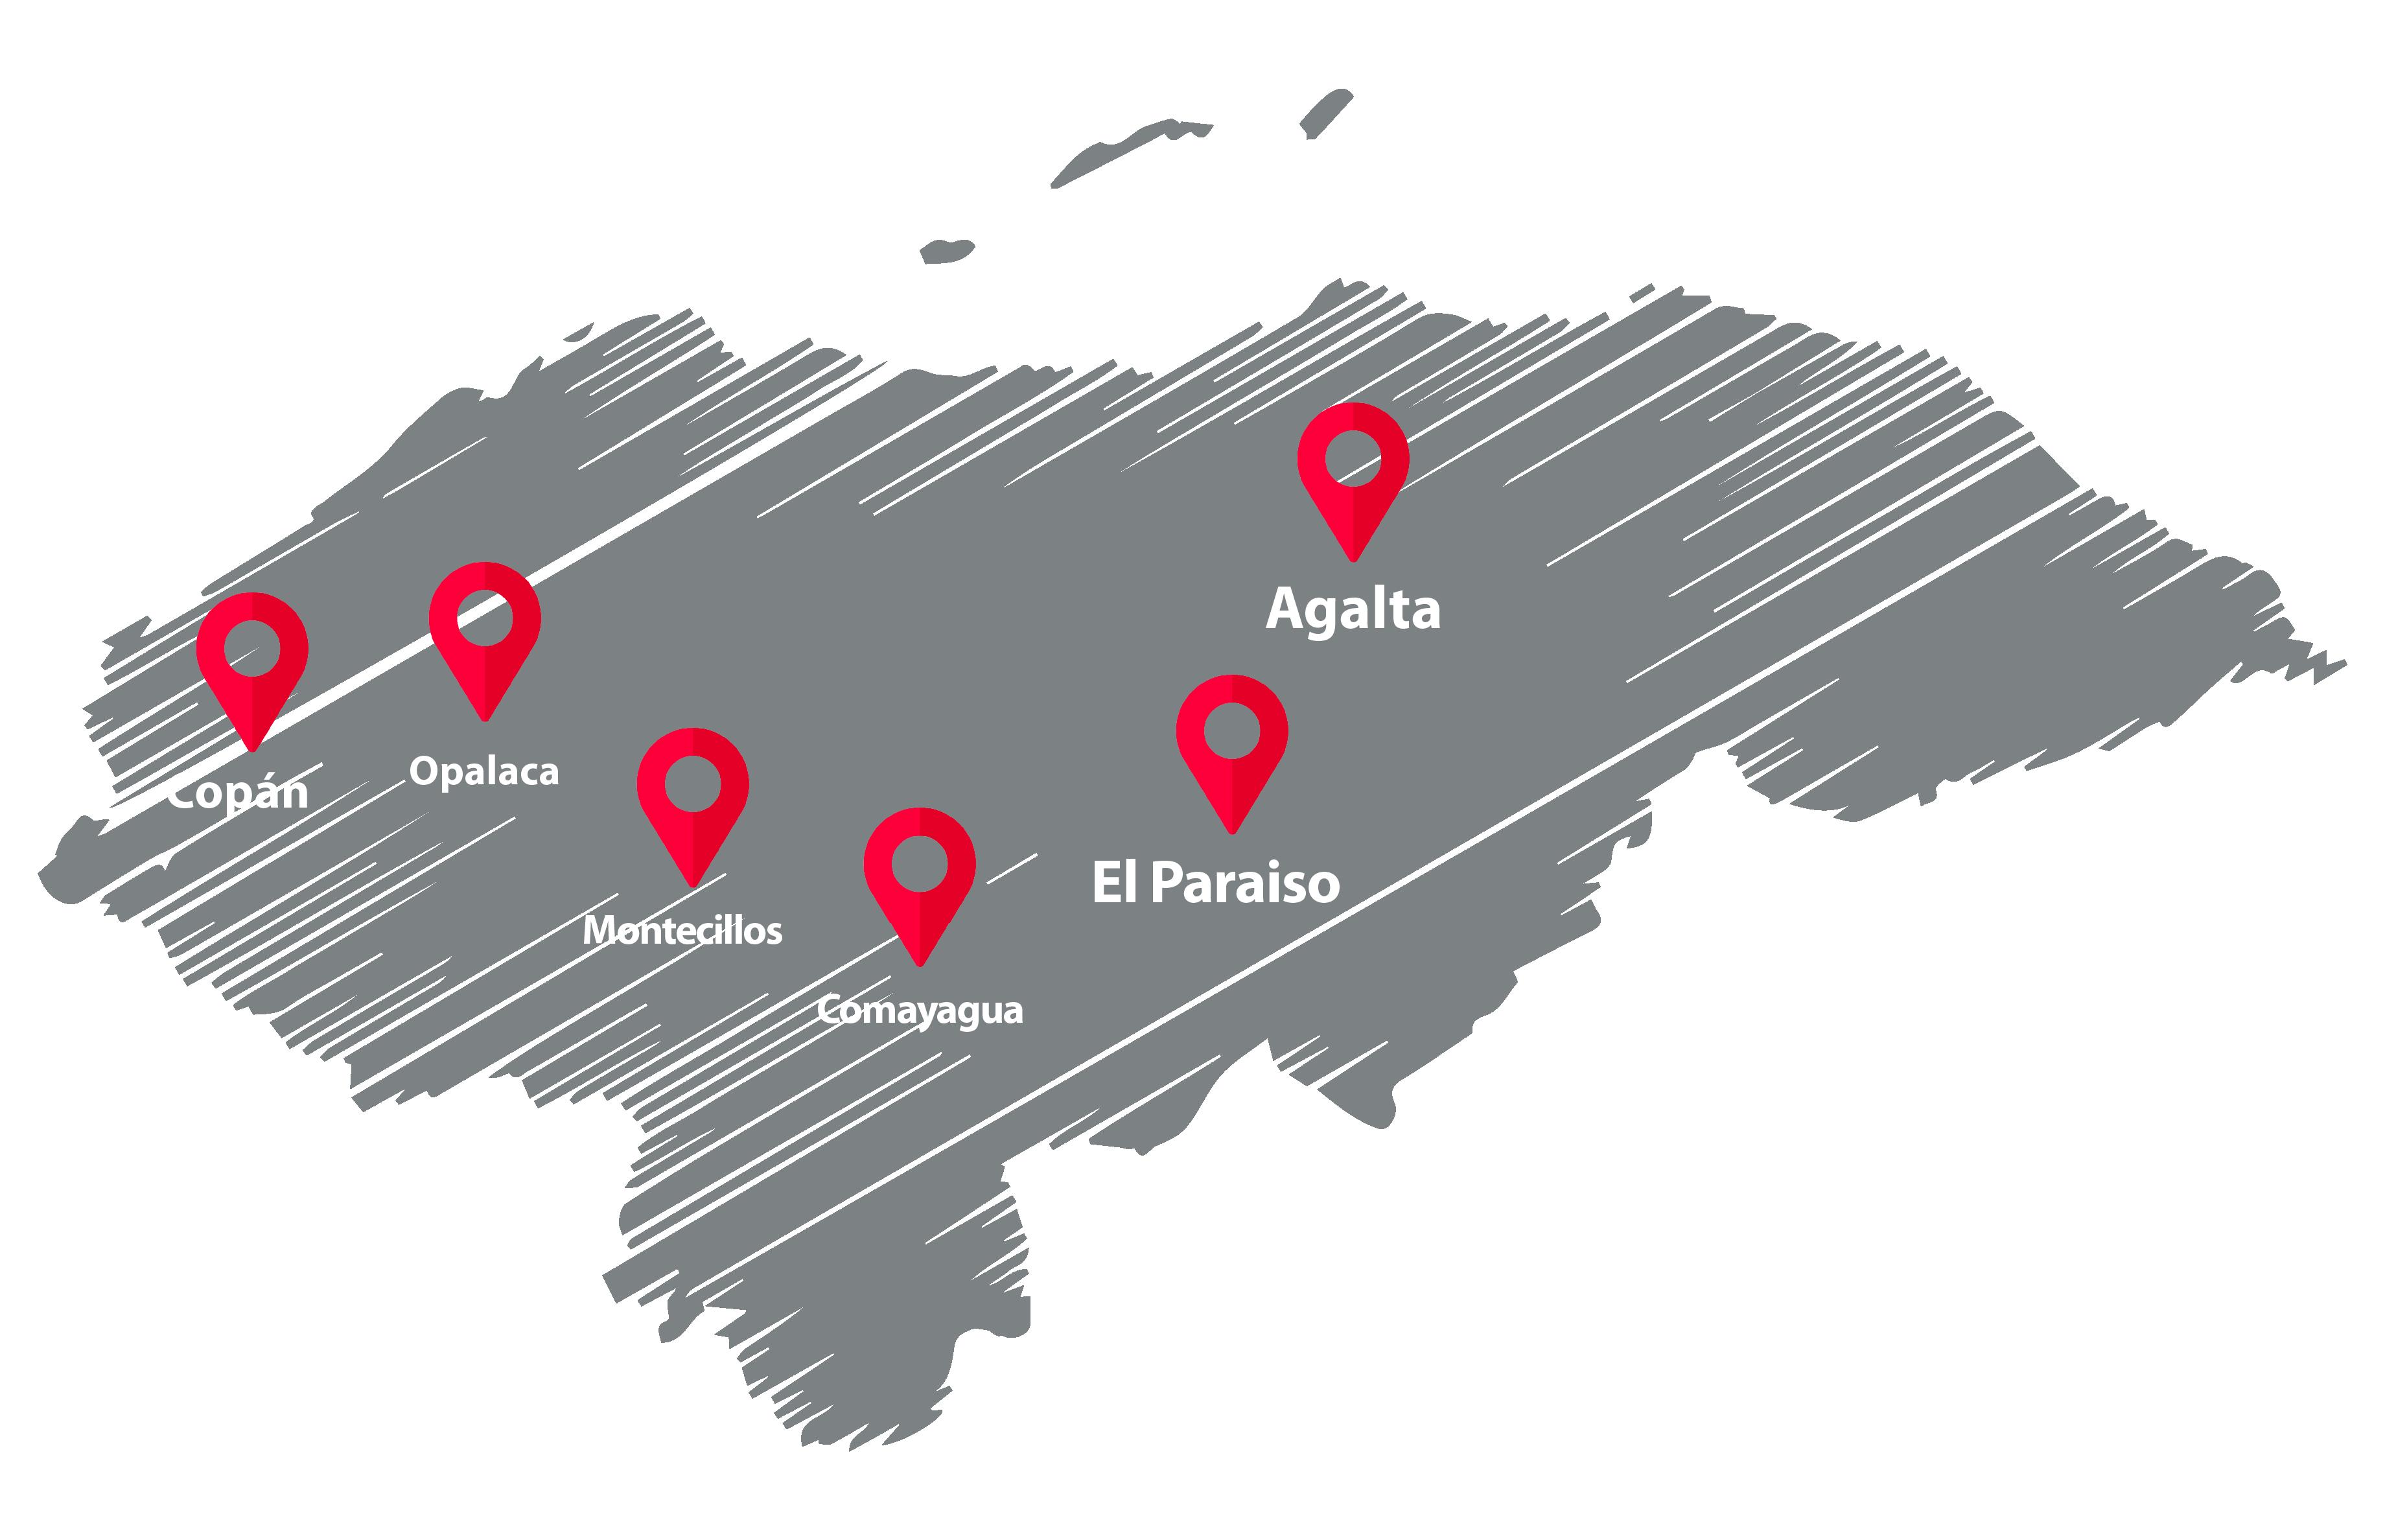 mapa chpp web-07